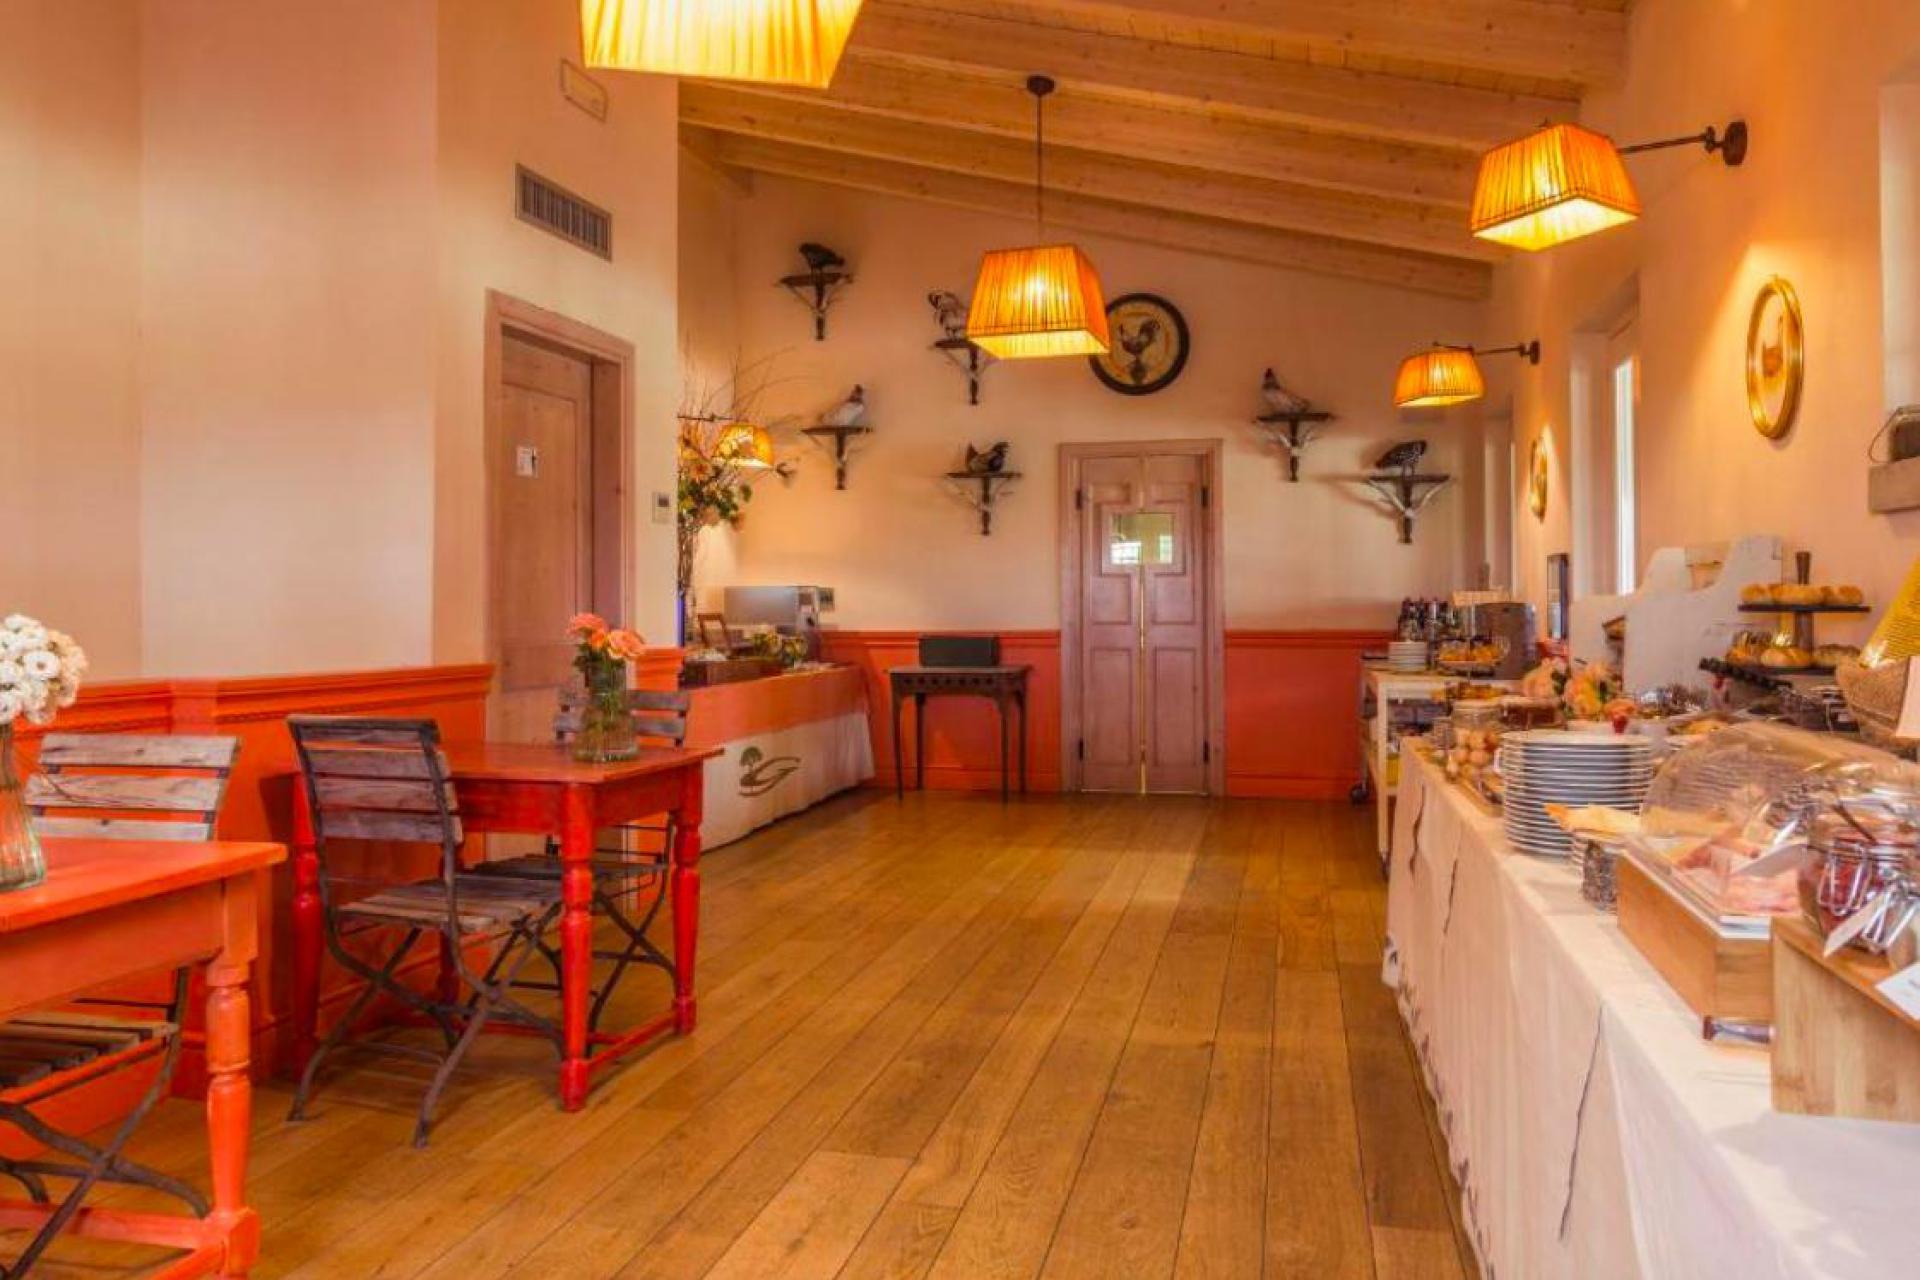 Grote agriturismo met restaurant en aperitivo bar